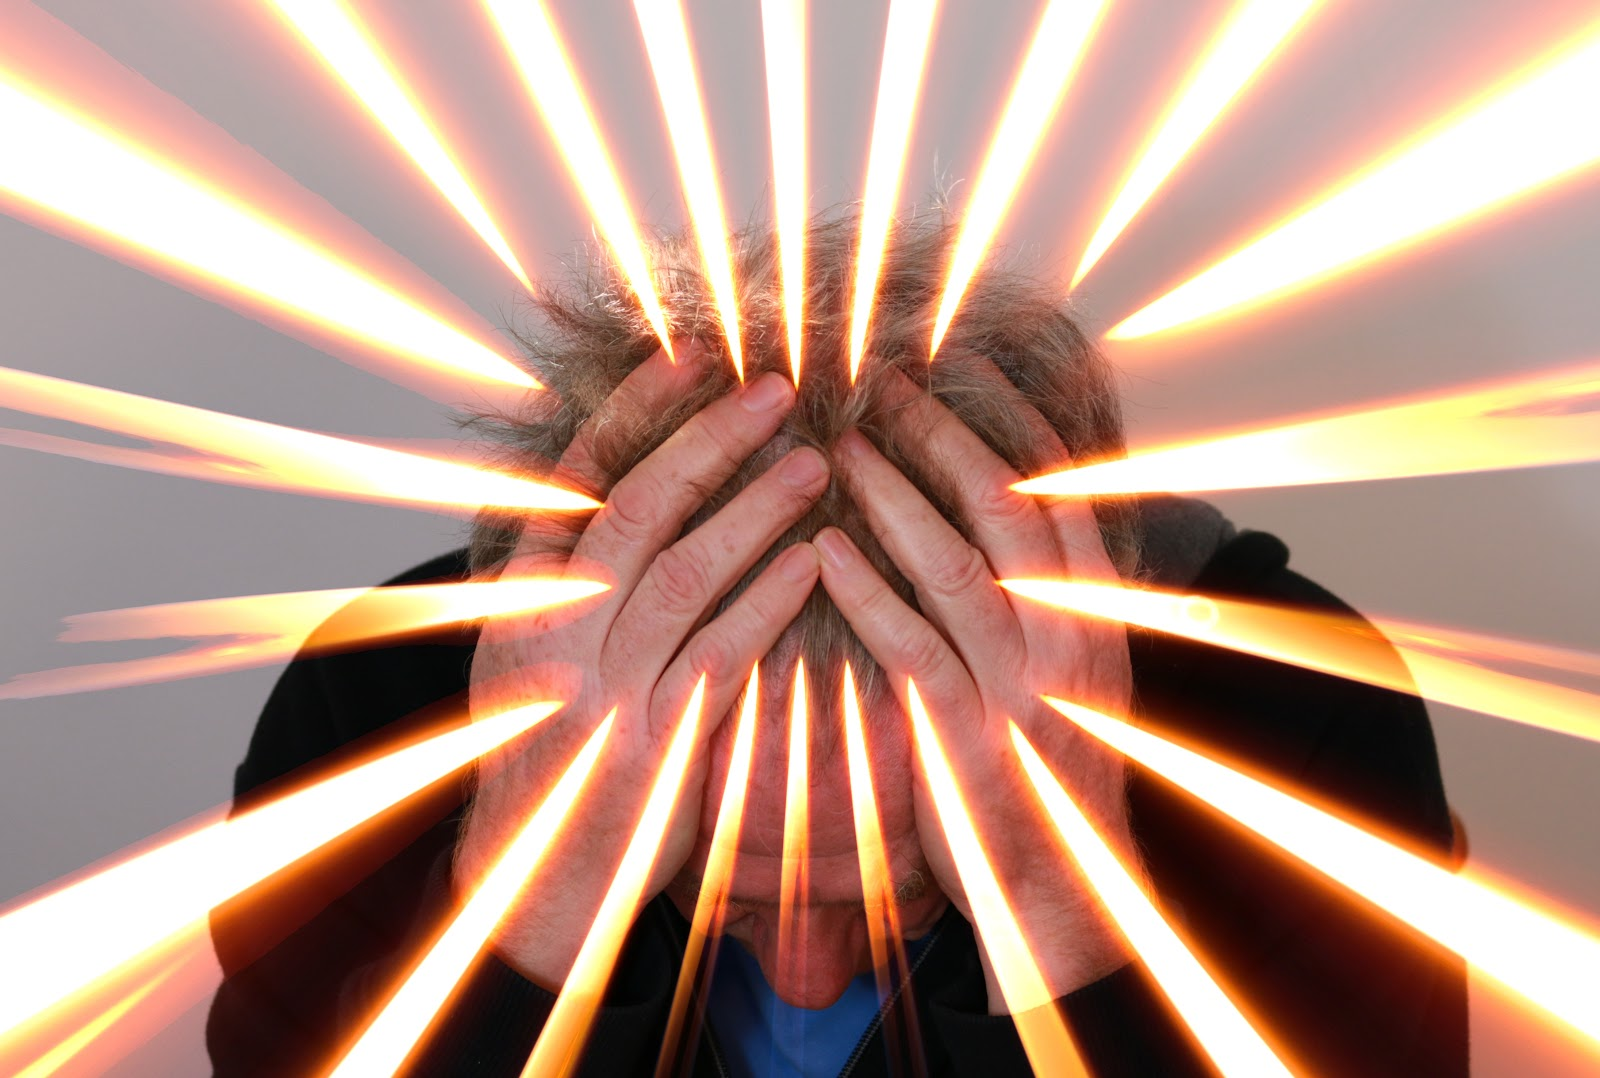 https://get.pxhere.com/photo/work-hand-man-light-sunlight-old-reflection-ferris-wheel-color-flame-fire-profession-burn-face-design-psychology-symmetry-shape-stress-voltage-psychotherapy-headache-burnout-psycholgie-770755.jpg